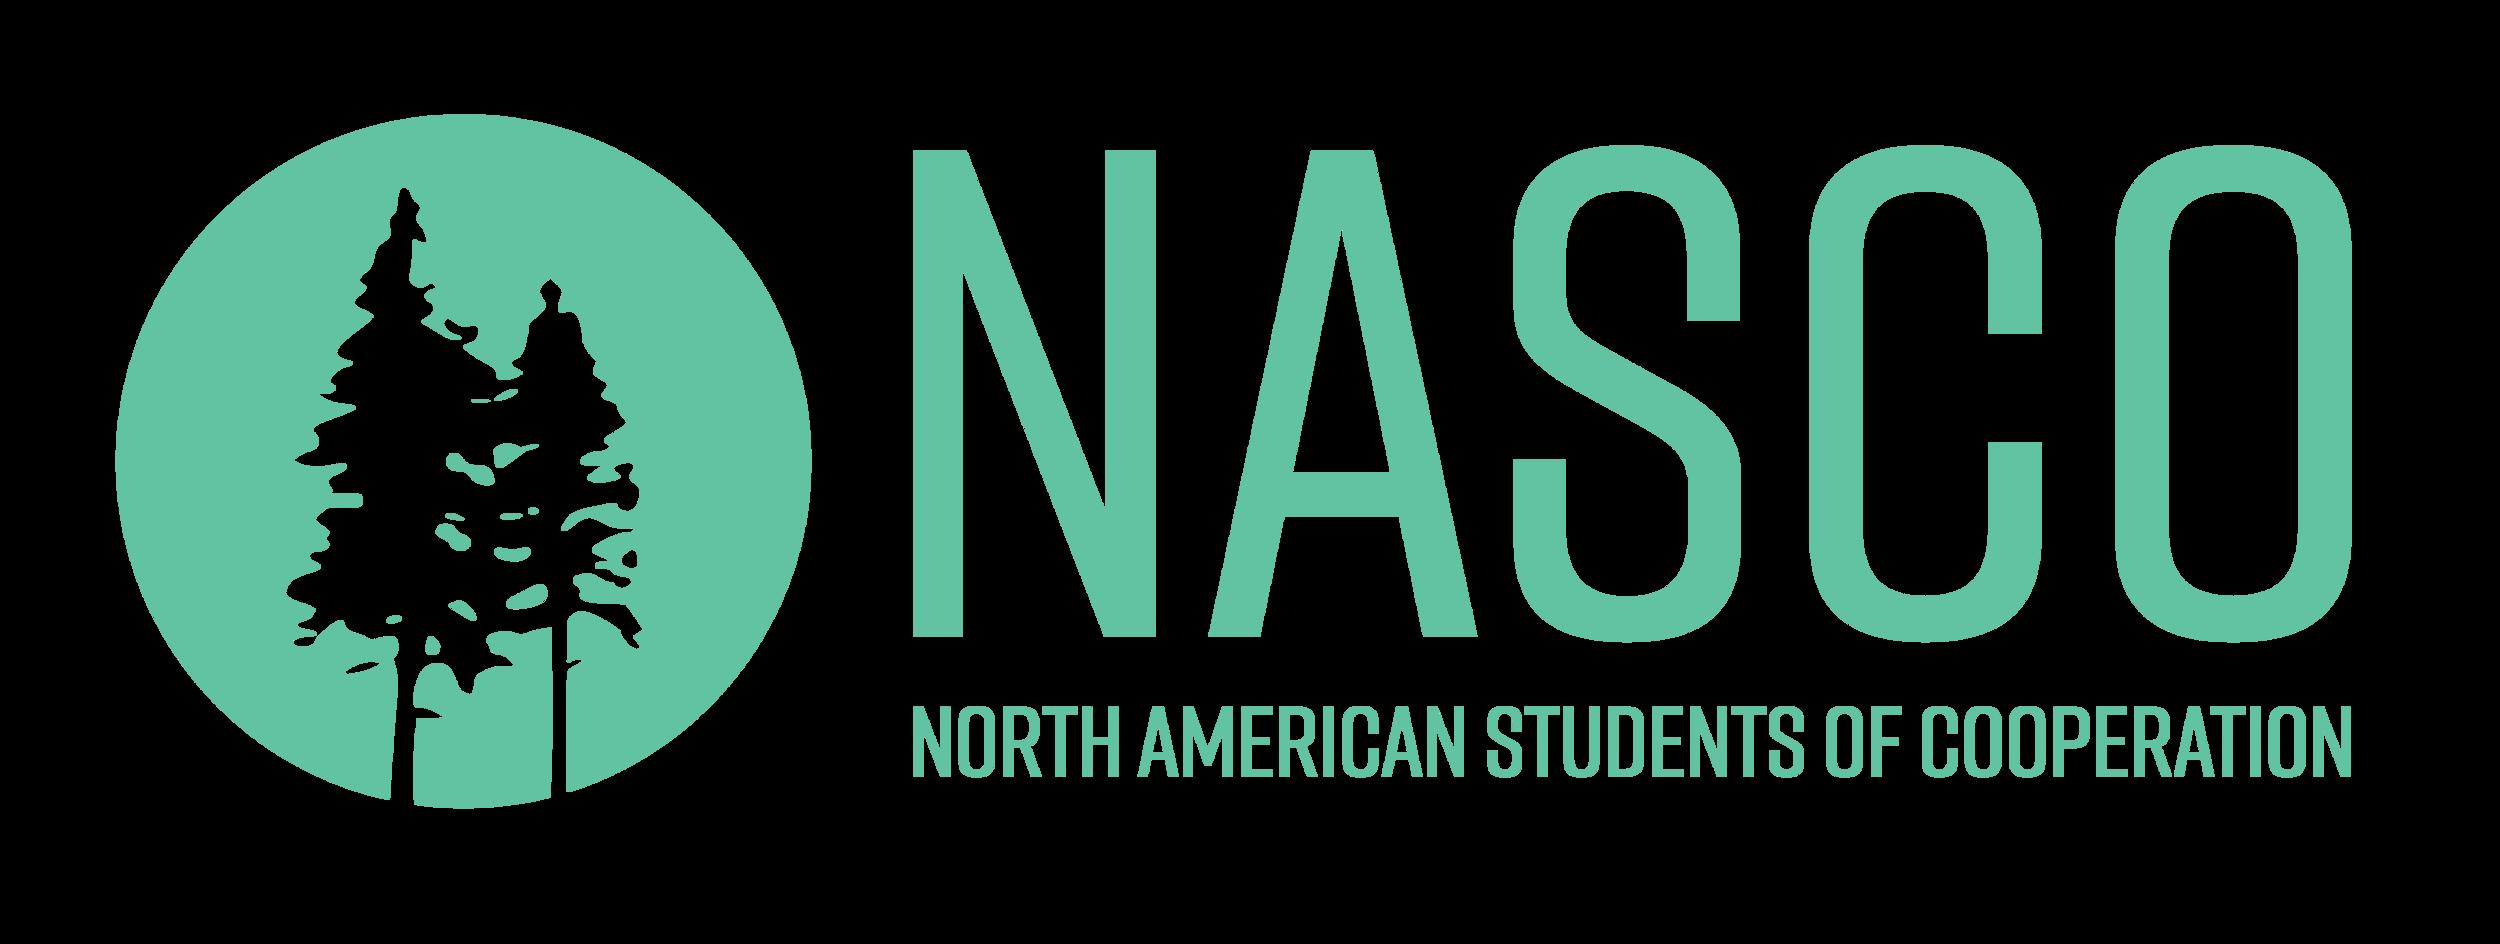 NASCO_logo_mint.png